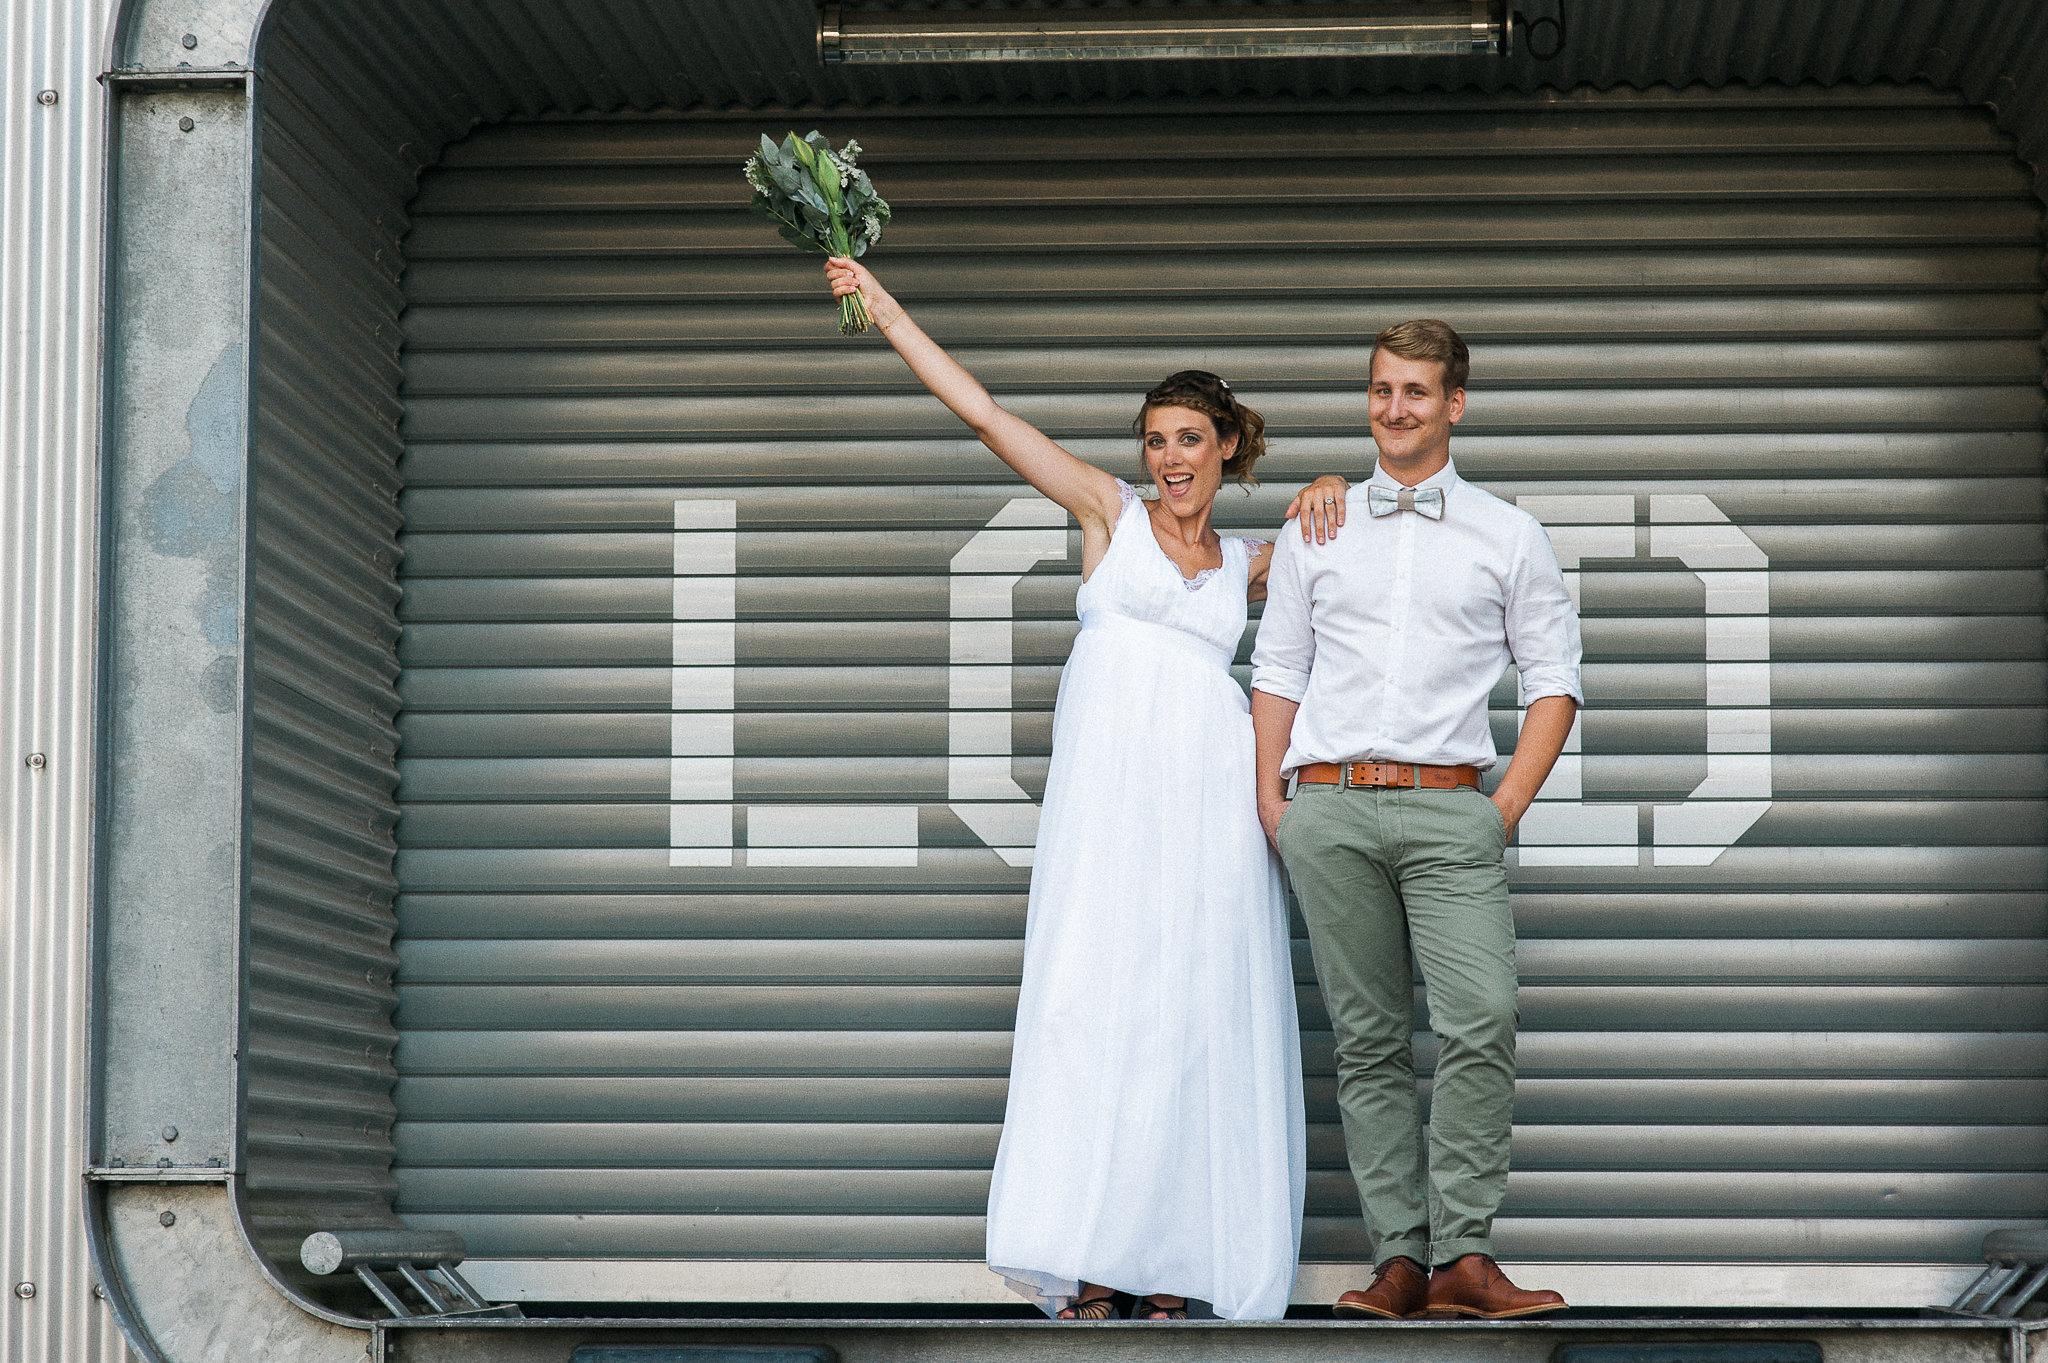 concours-funky-wedding-combi-volkswagen-vintage-crest-la-boheme (2)